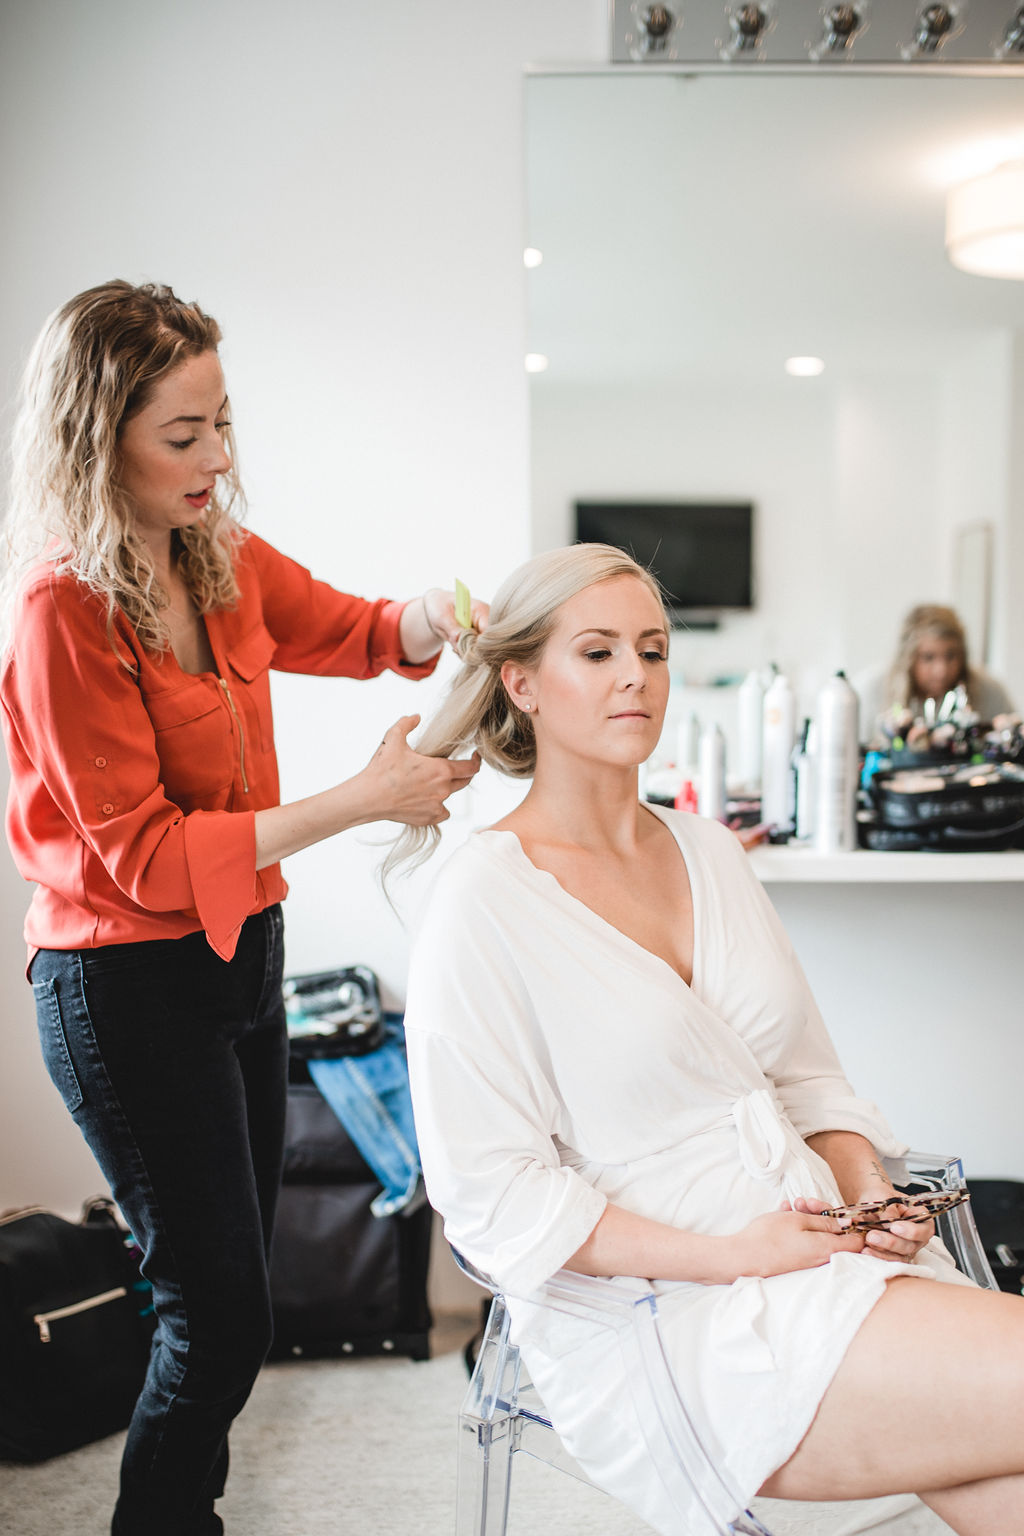 Cristina Ziemer getting ready hair stylist | Kelly and Matt | Hutton House | Aqua Fox Photography | Sixpence Events and Planning Minnesota Wedding Planner24.jpg